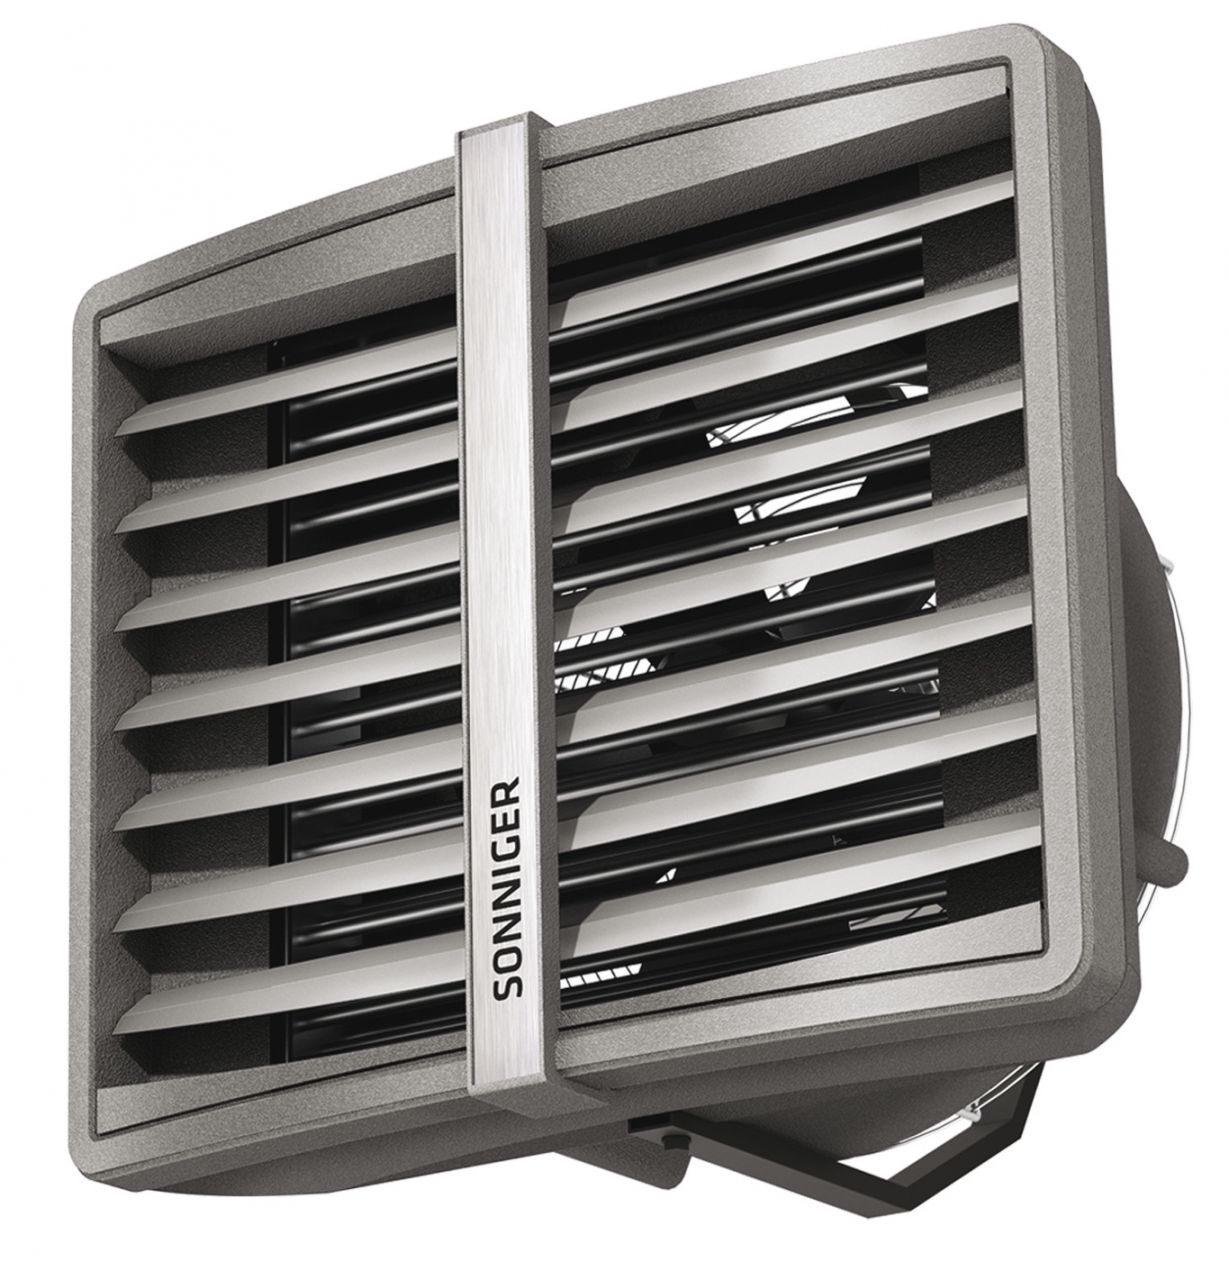 HEATER R3 termoventilátor AC motorral ,tartókonzollal Vmax=4400m3/h 50-70 kW